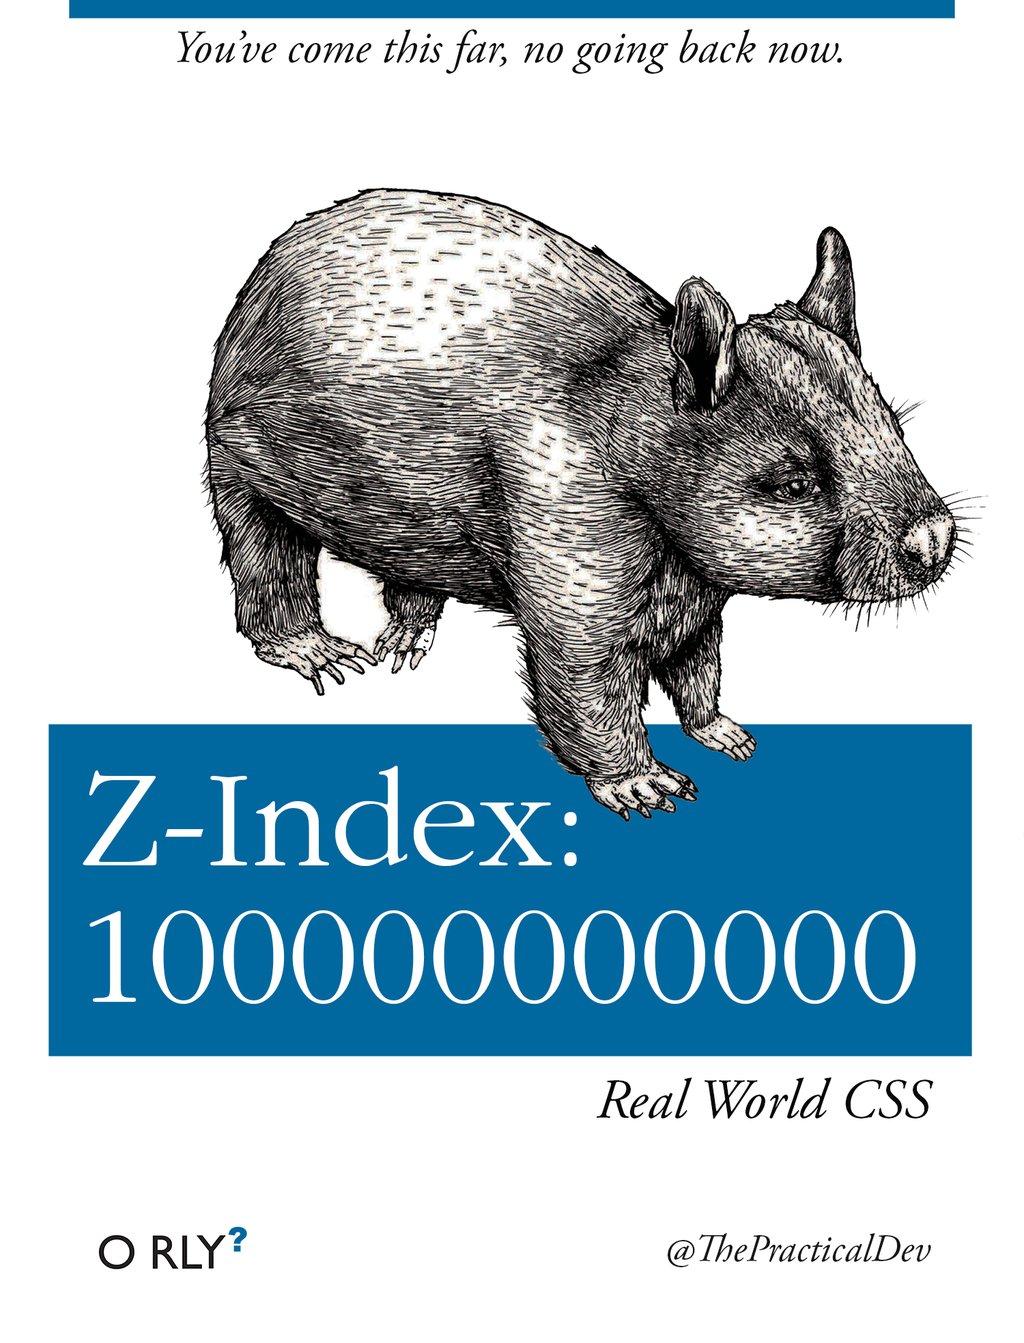 z-index: 100000000000